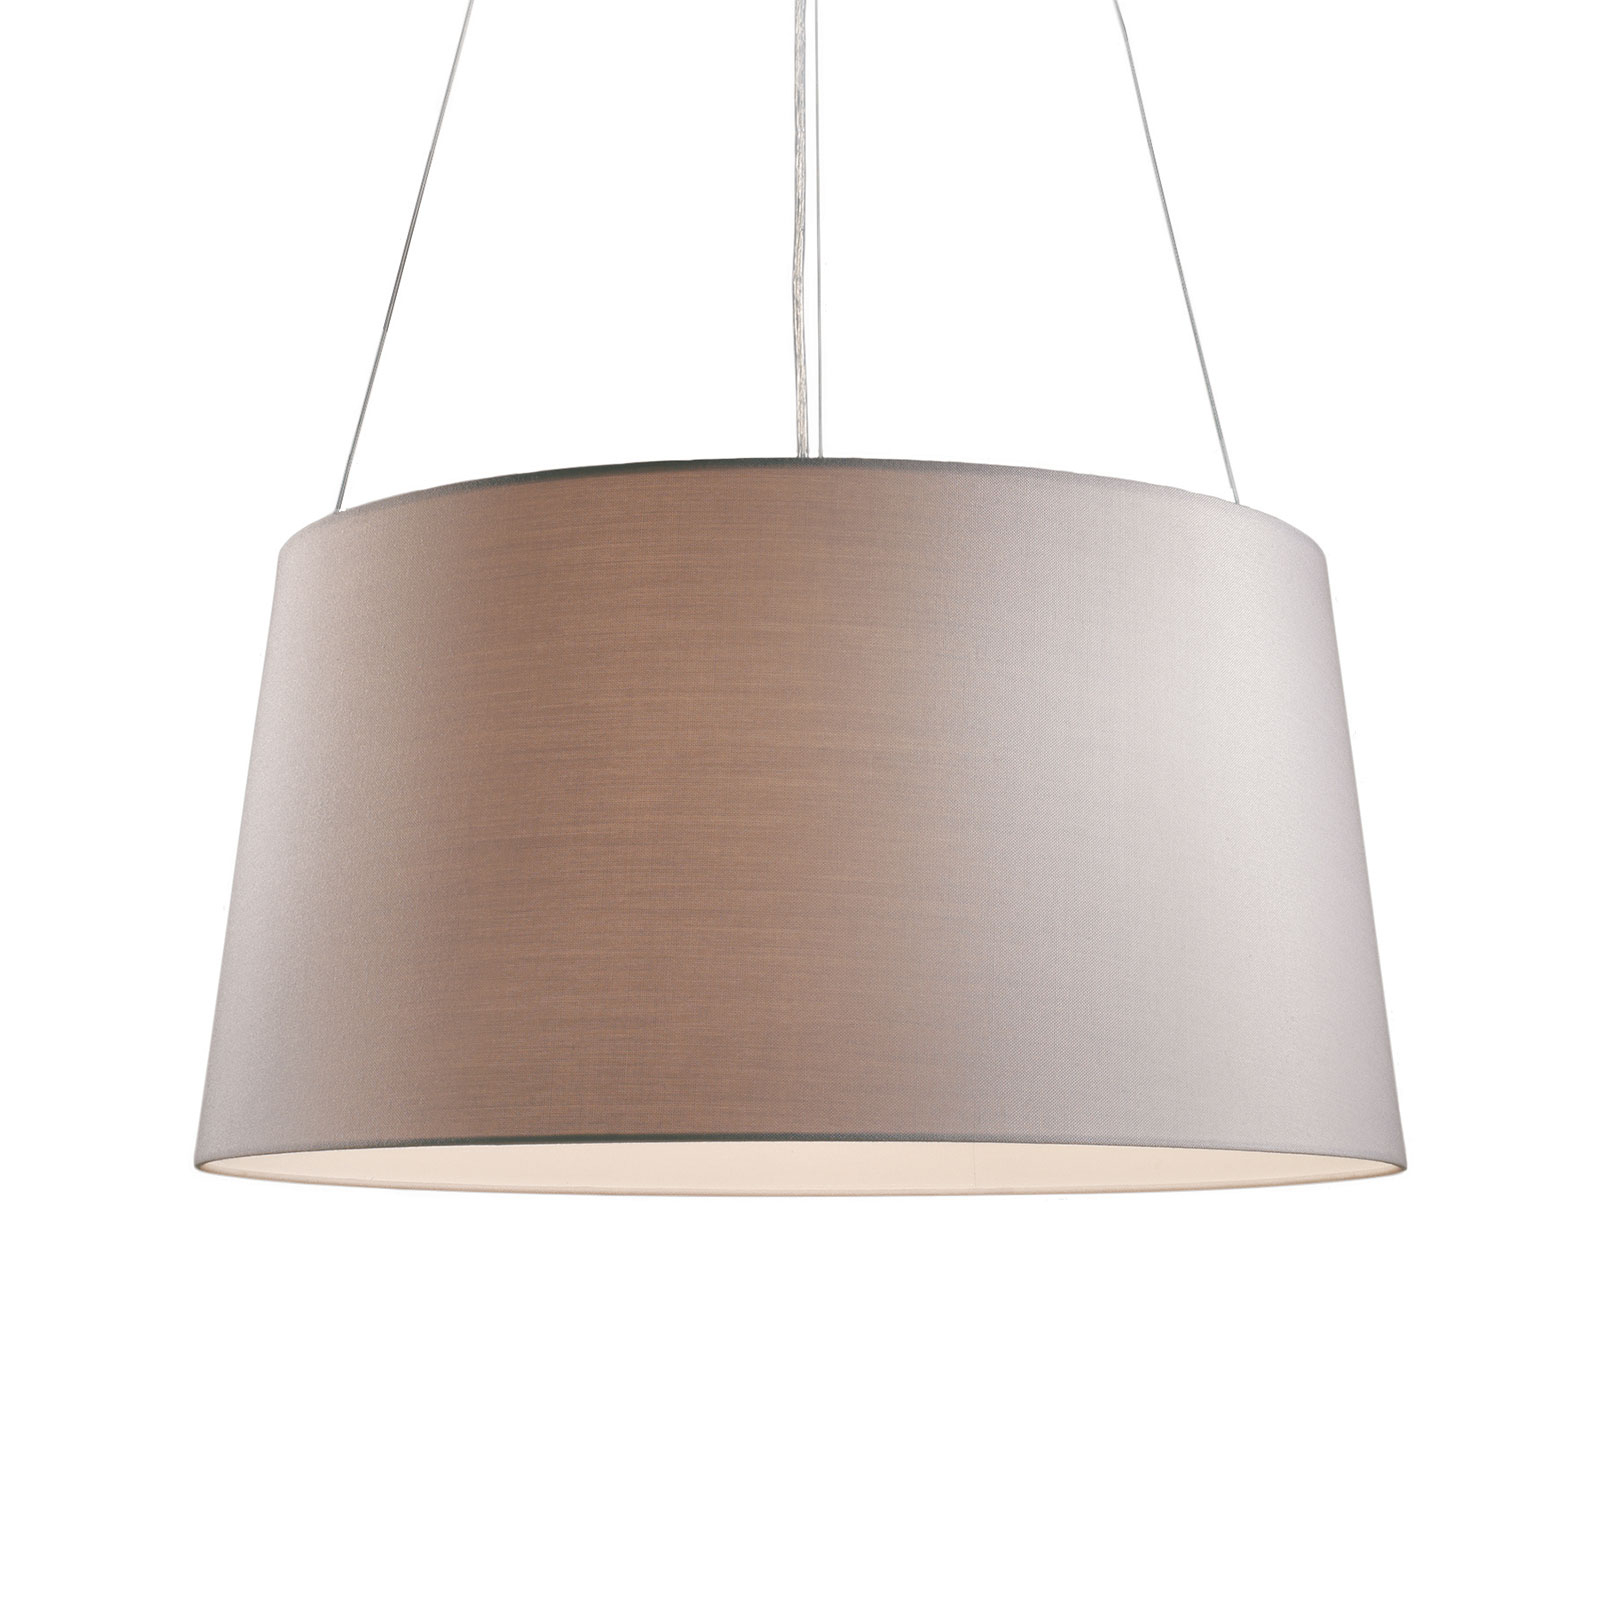 Kundalini Tripod lampa wisząca, kremowa